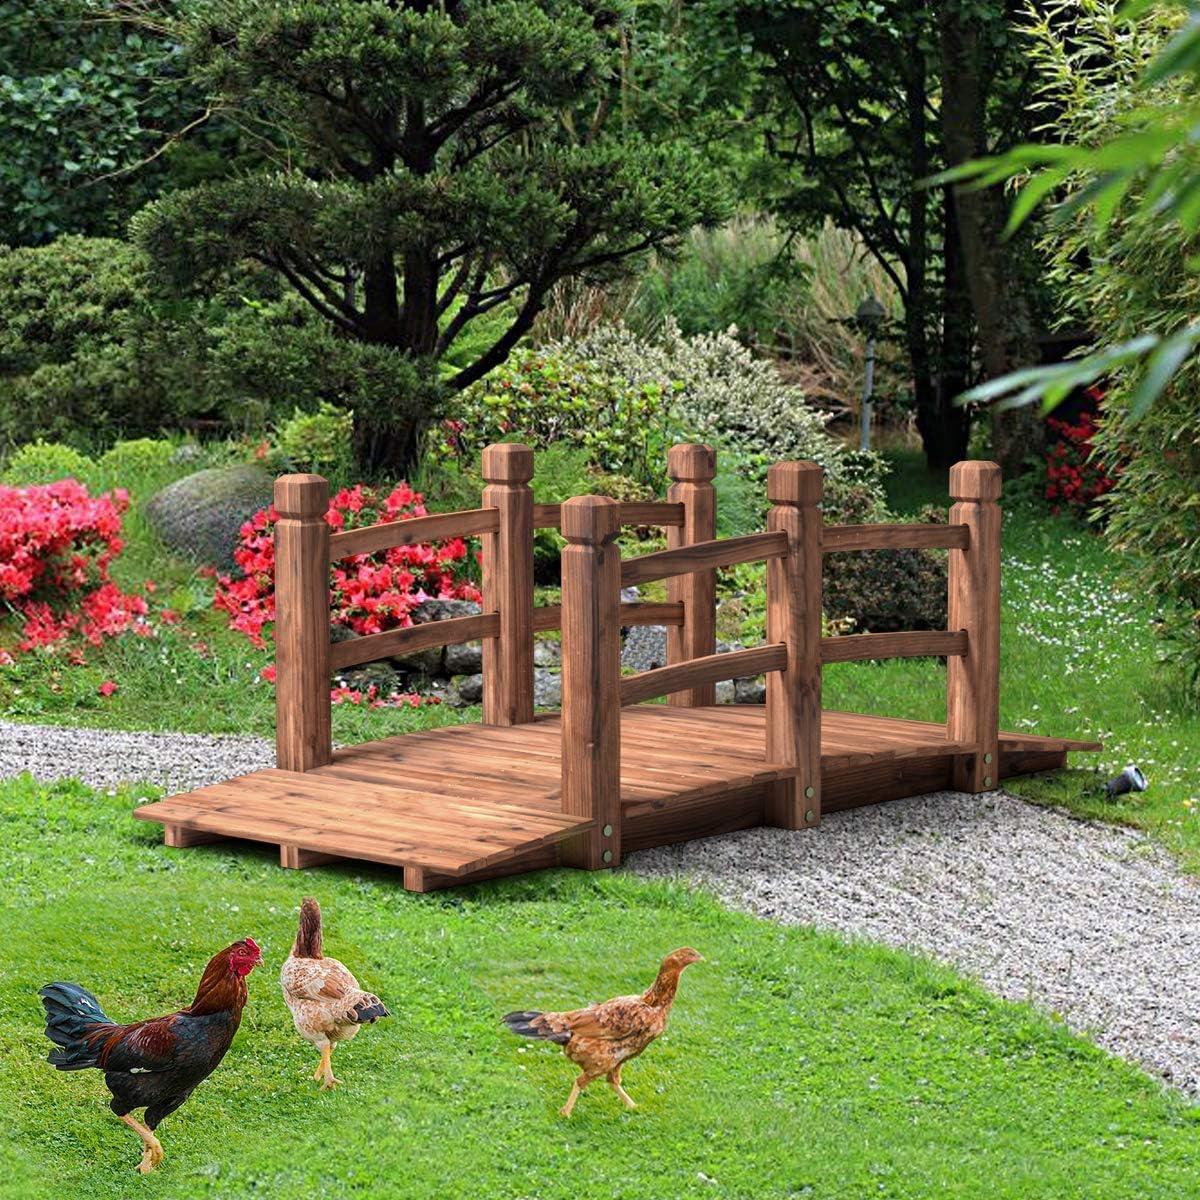 Amazon Com Happygrill Wooden Garden Bridge Stained Finish Decorative Pond Bridge 5ft Length Garden Outdoor